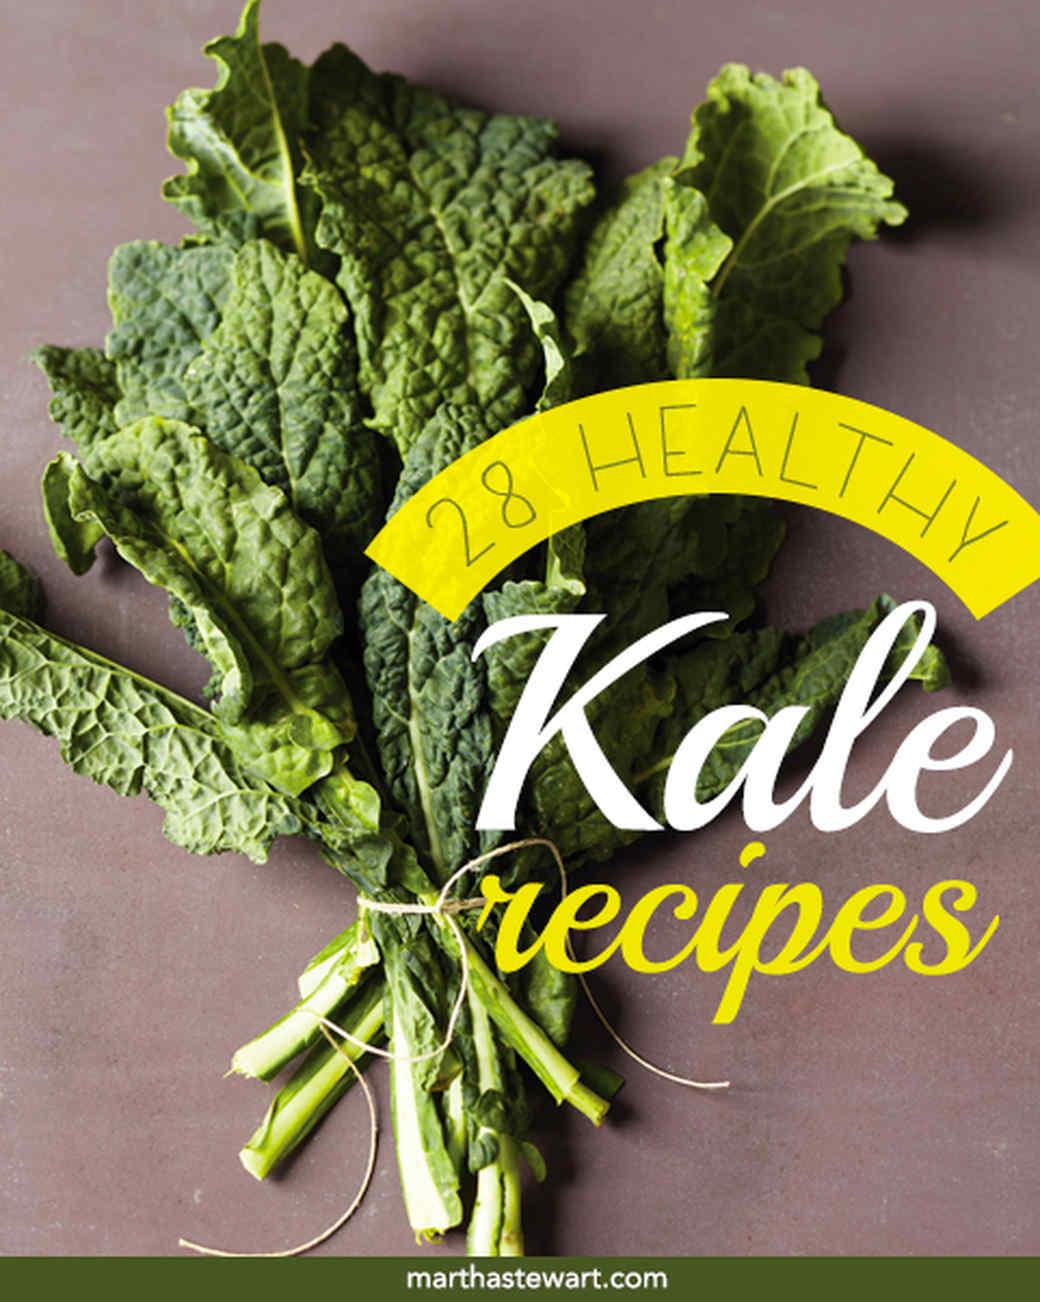 28-healthy-kale-recipes-0115.jpg